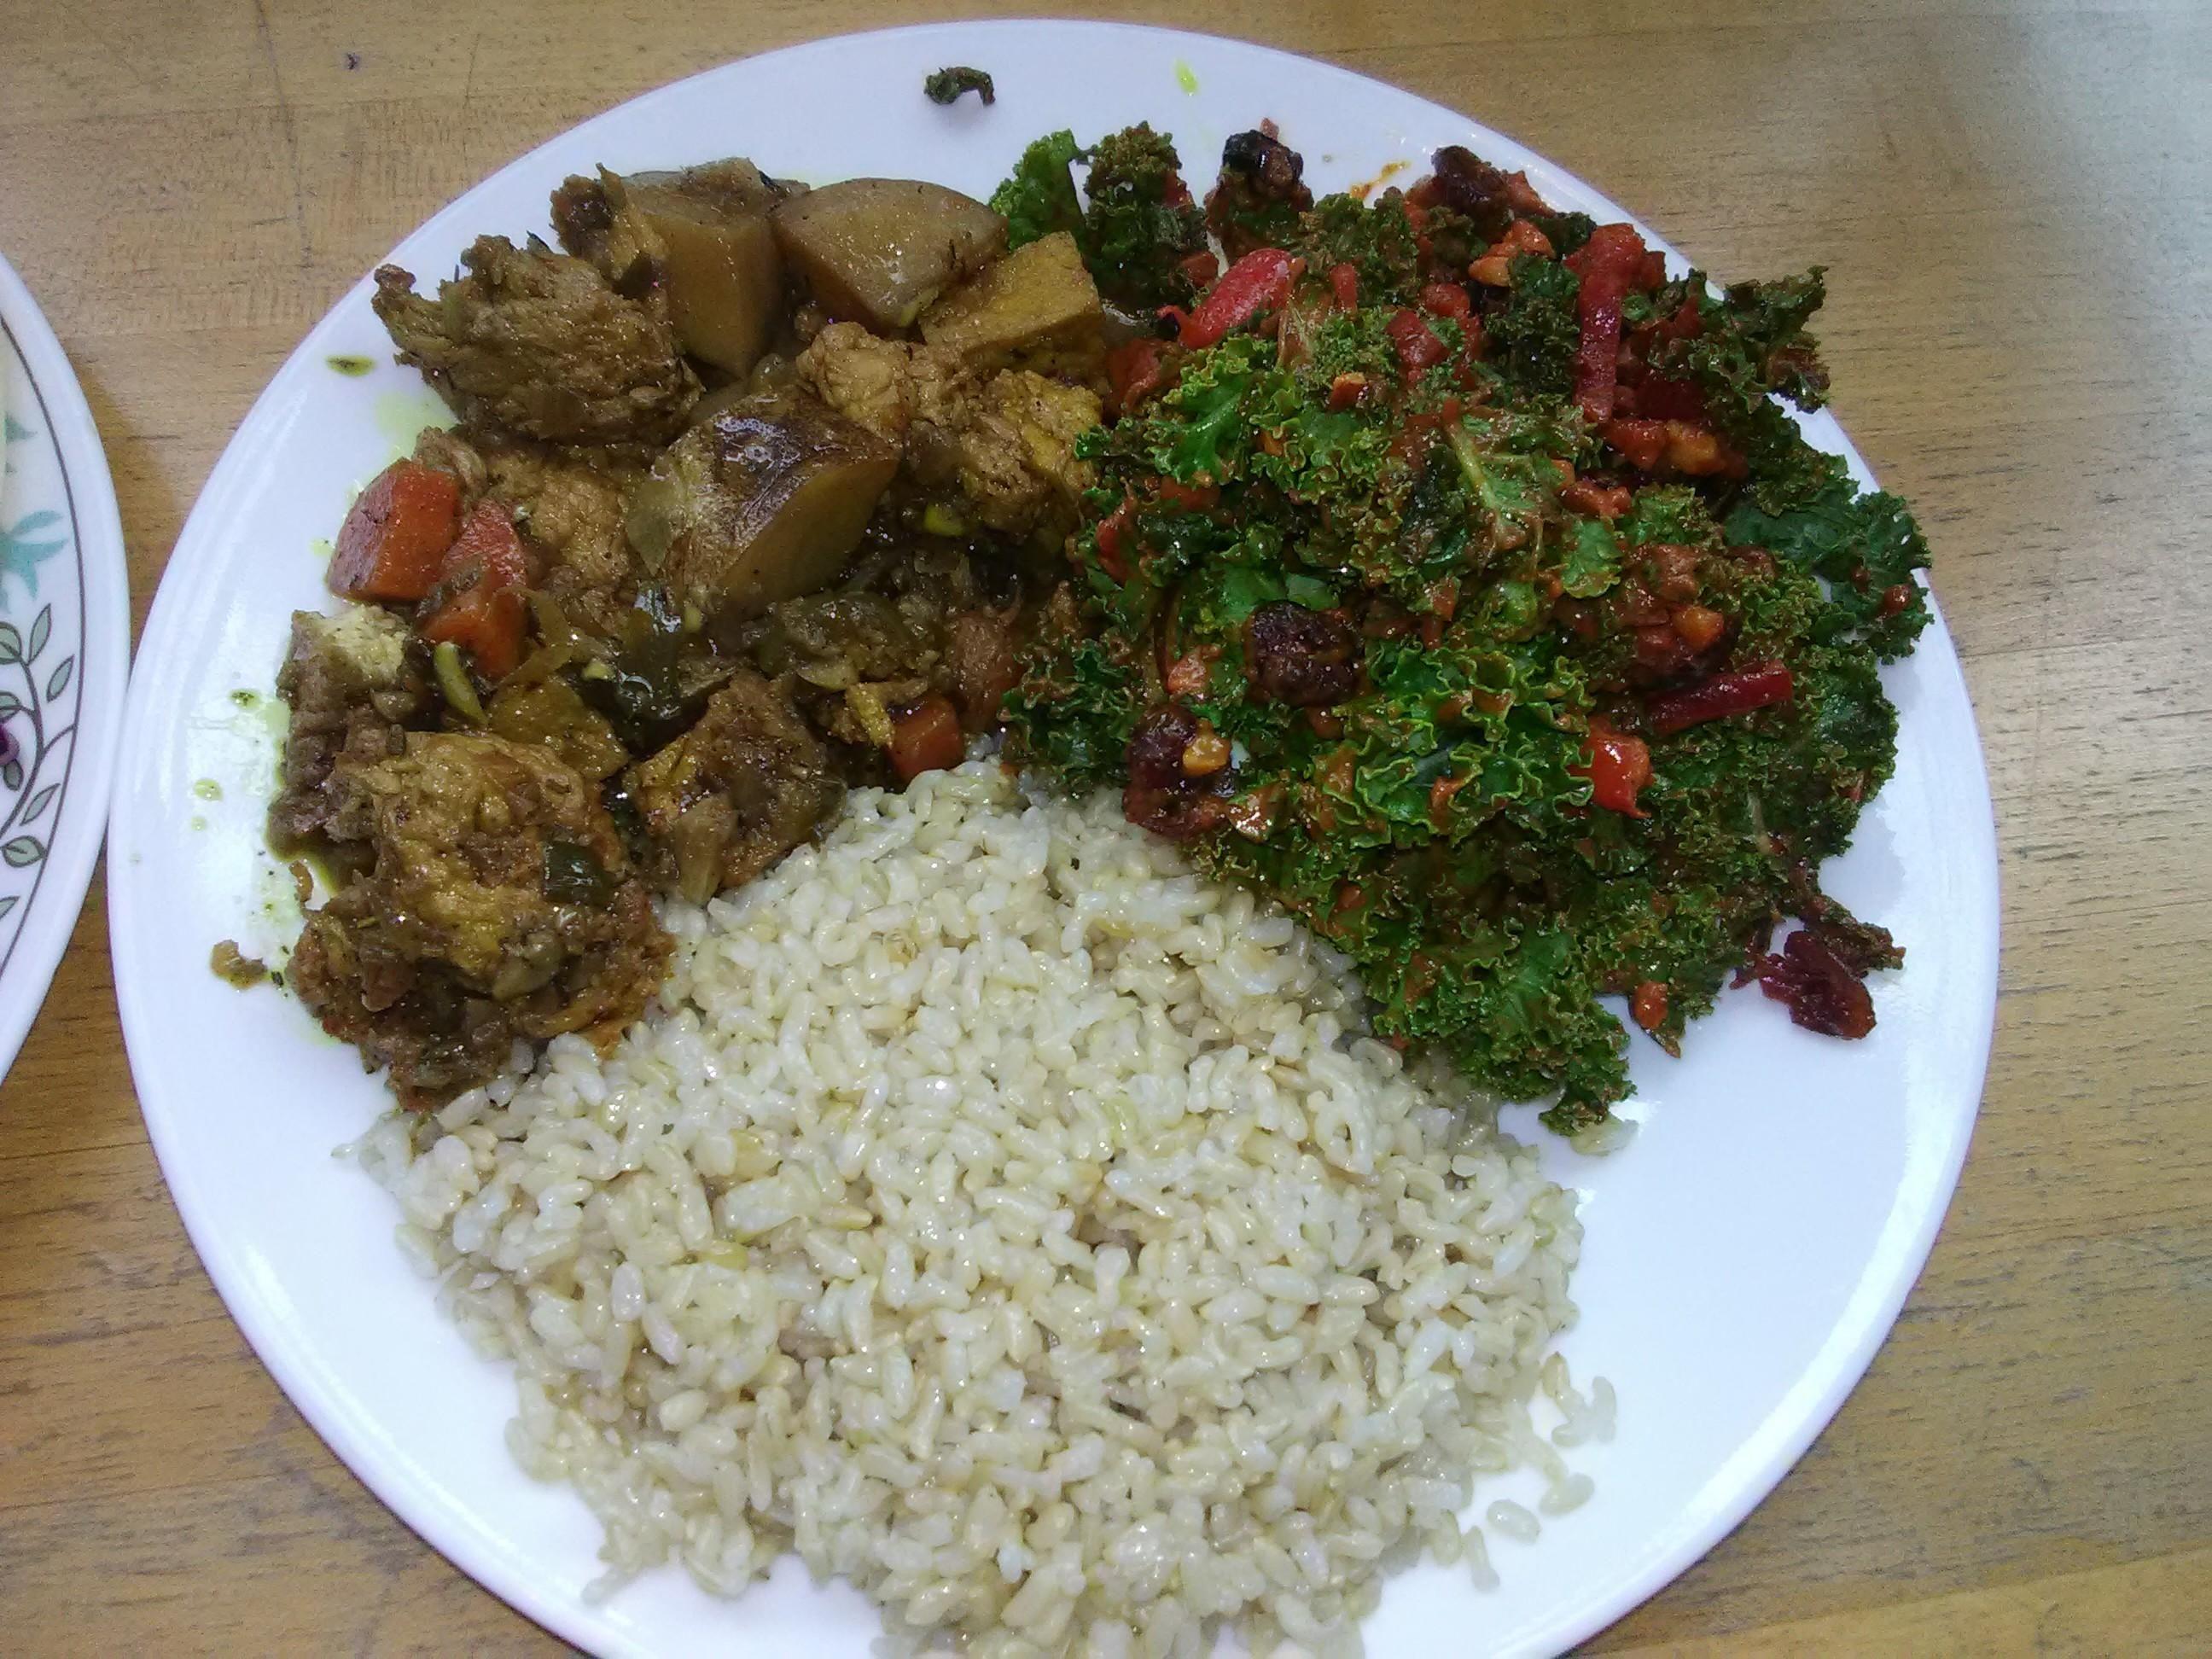 Jerk Tofu W Potatoes And Rice Plus Amazing Kale Salad W Ginger Turmeric Dressing Good Karma San Jose Ca